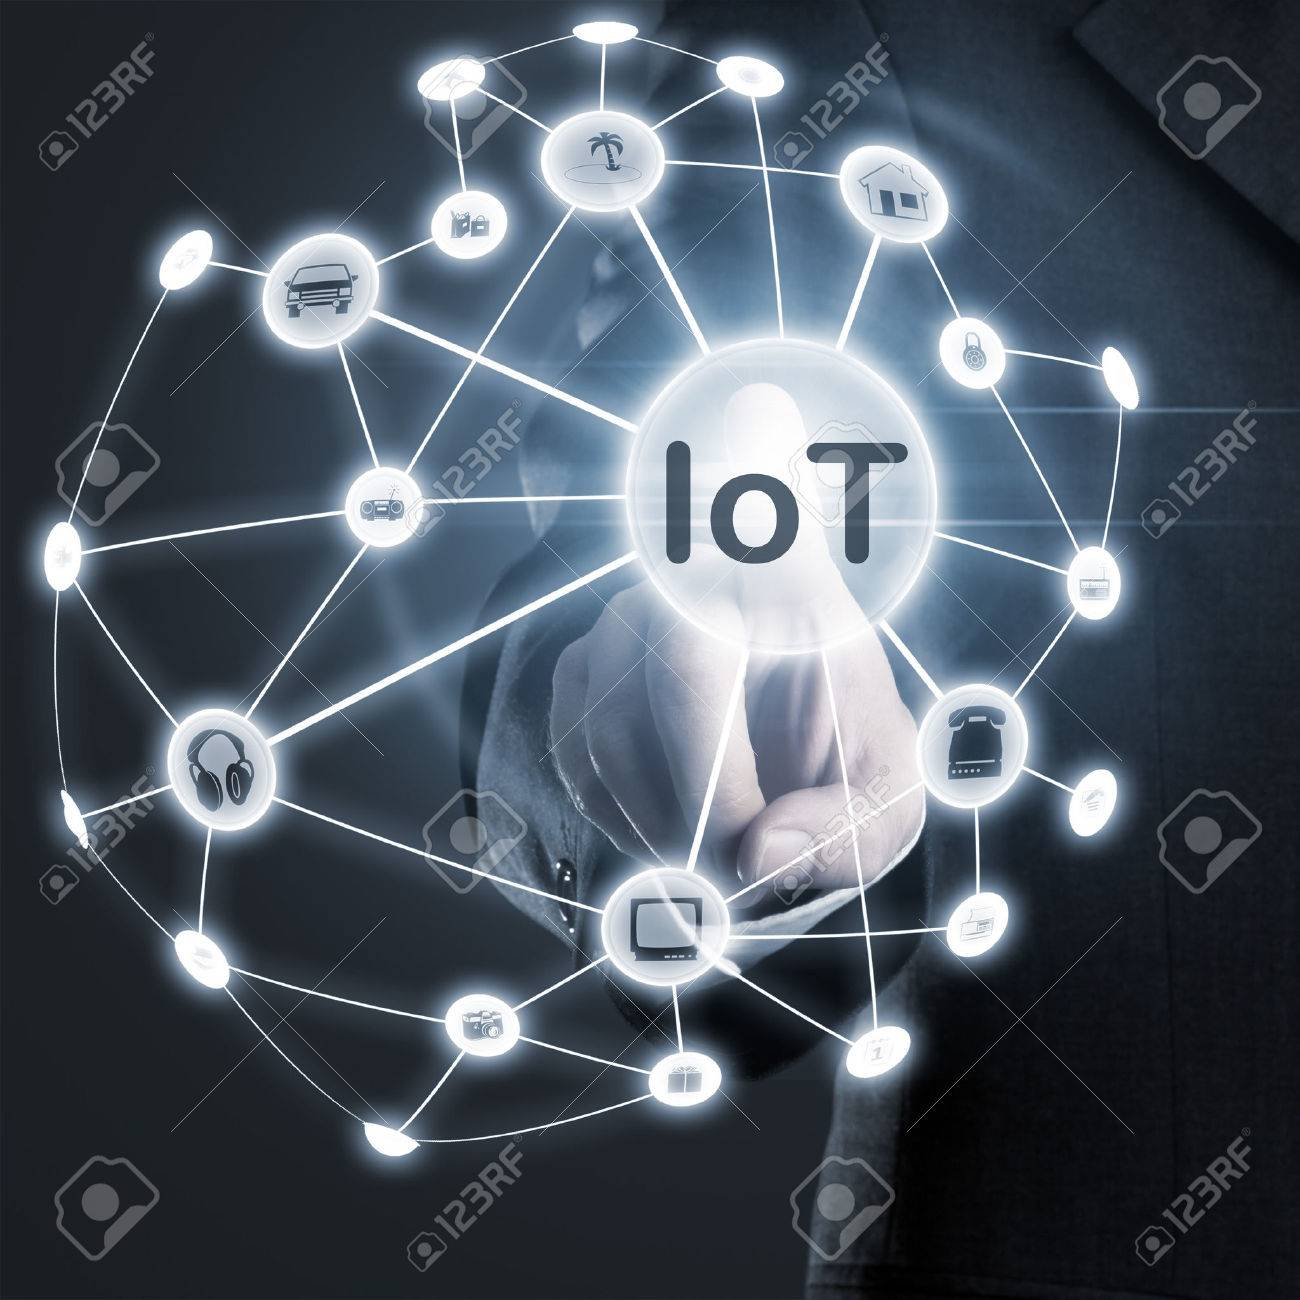 Man touching IoT (internet of things) network on display Standard-Bild - 44250002